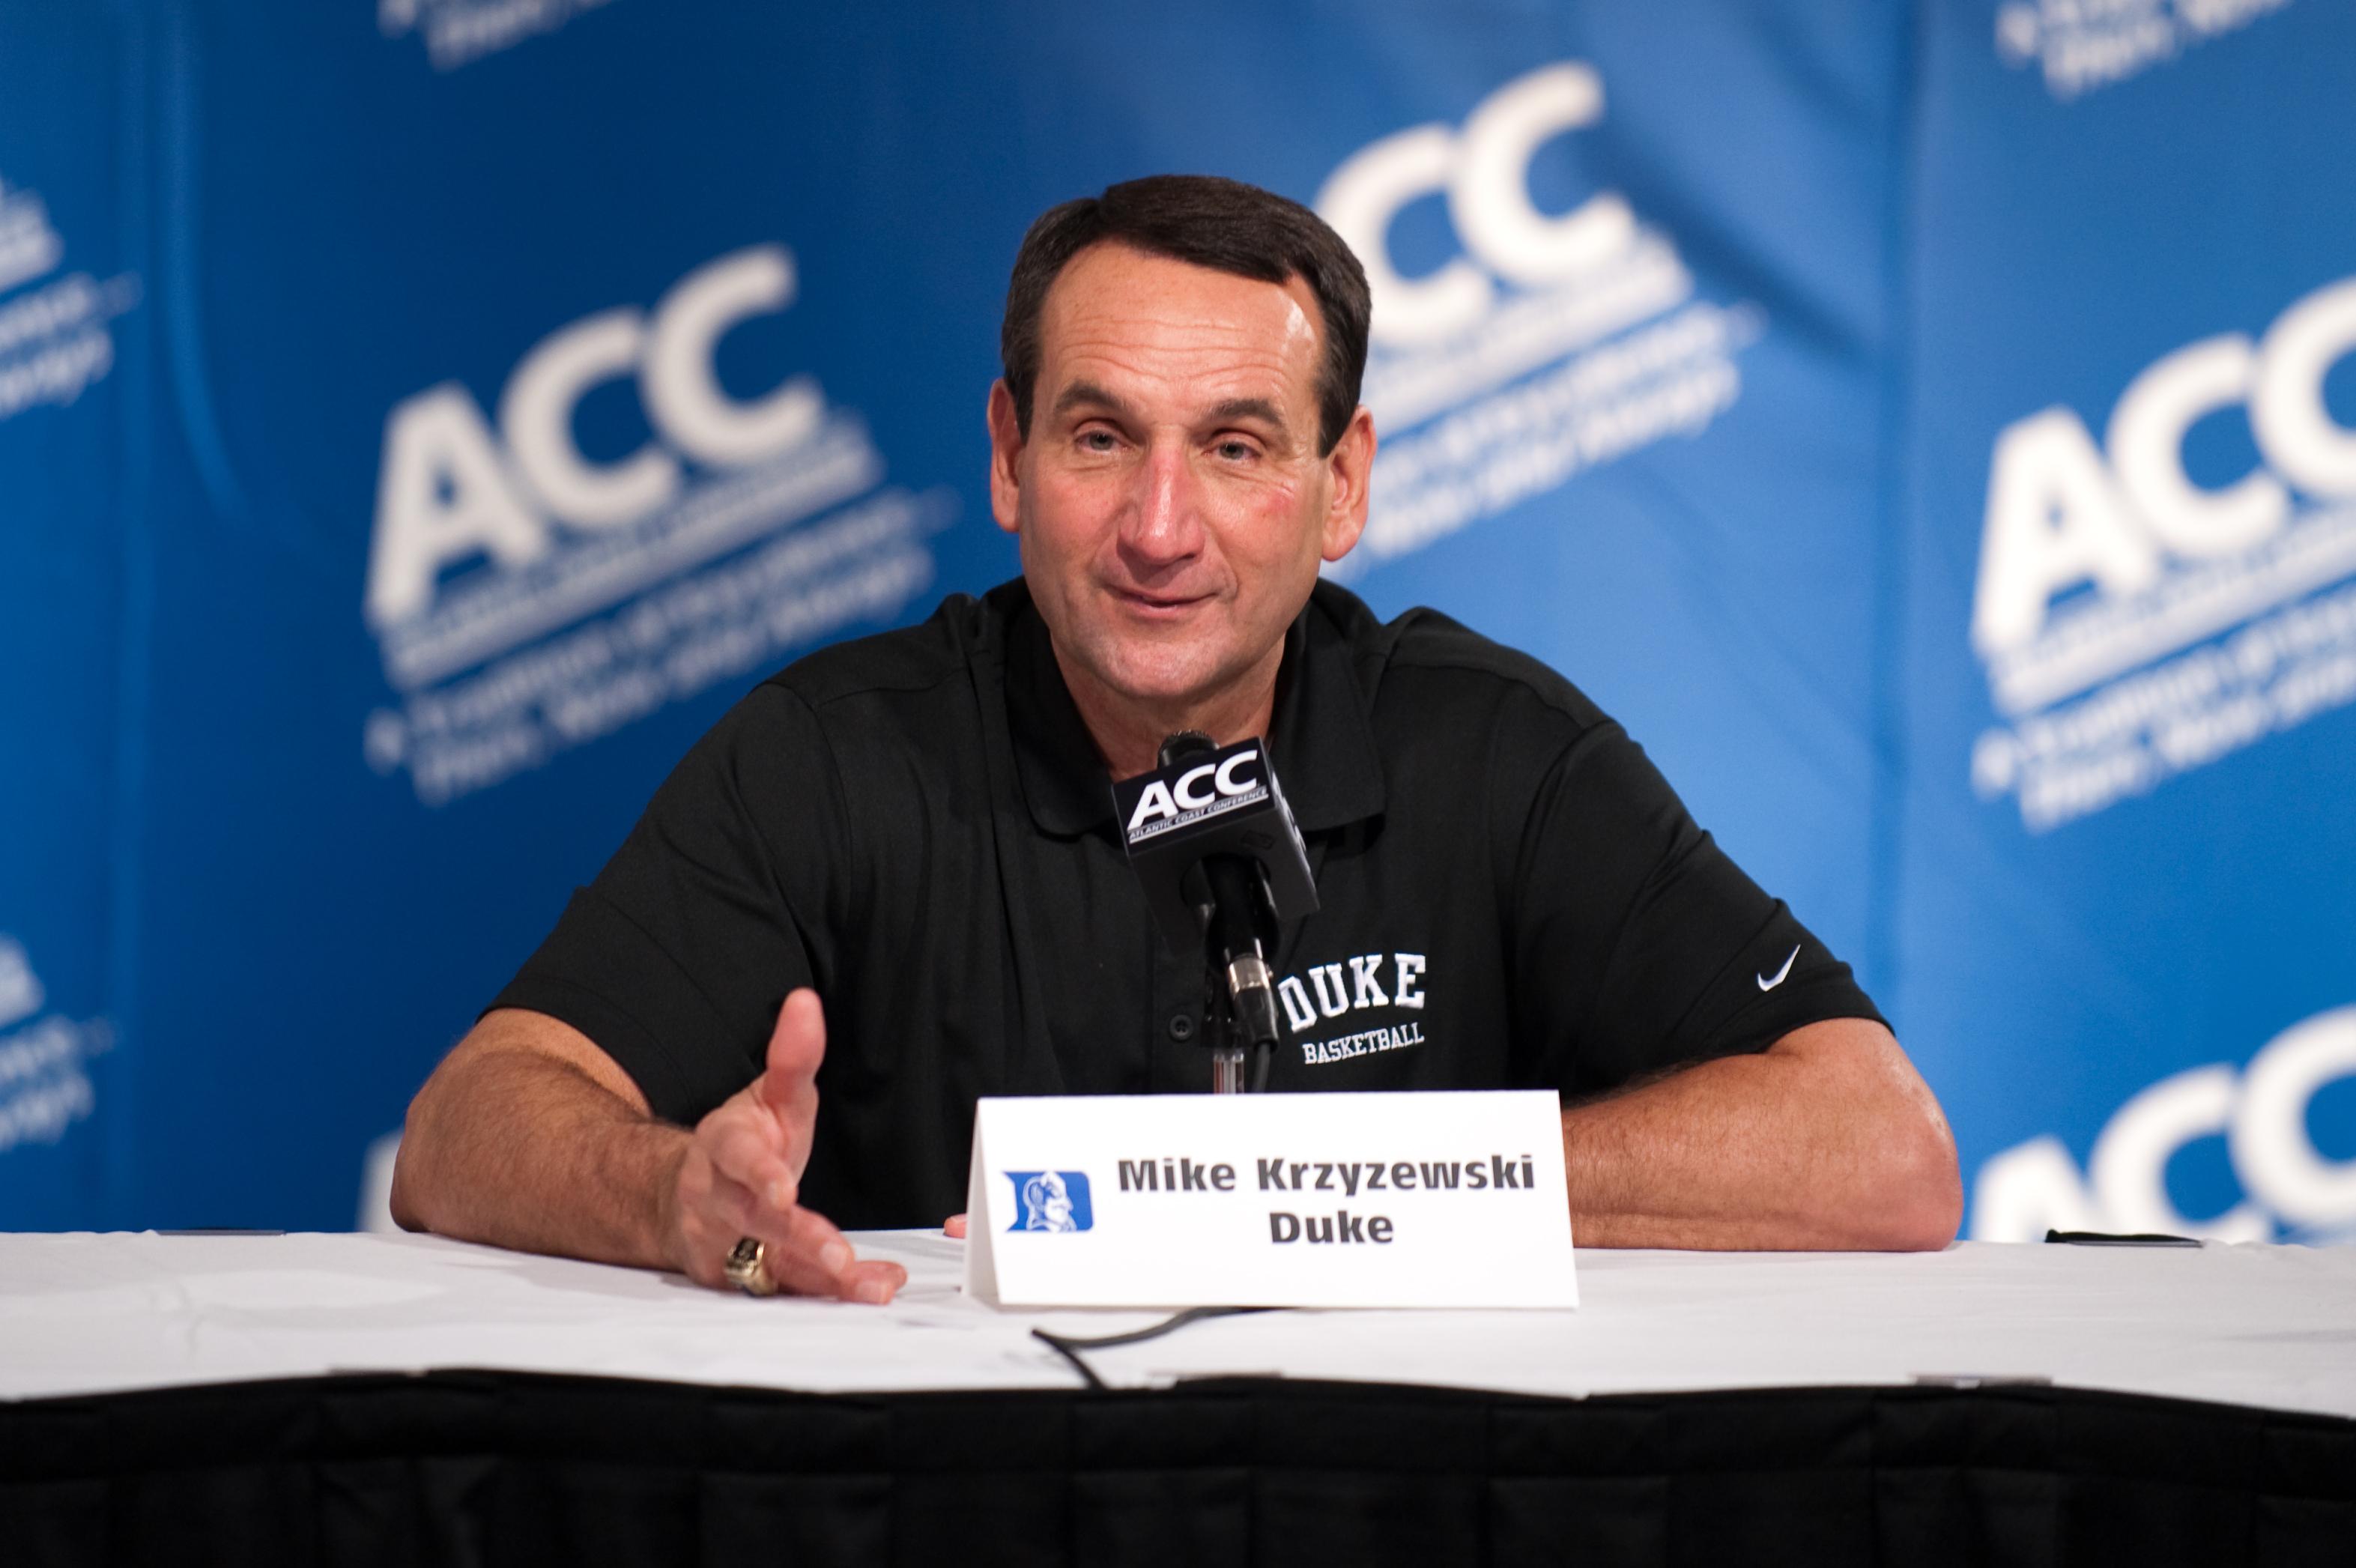 NCAA BASKETBALL: OCT 20 ACC Operation Basketball Media Day